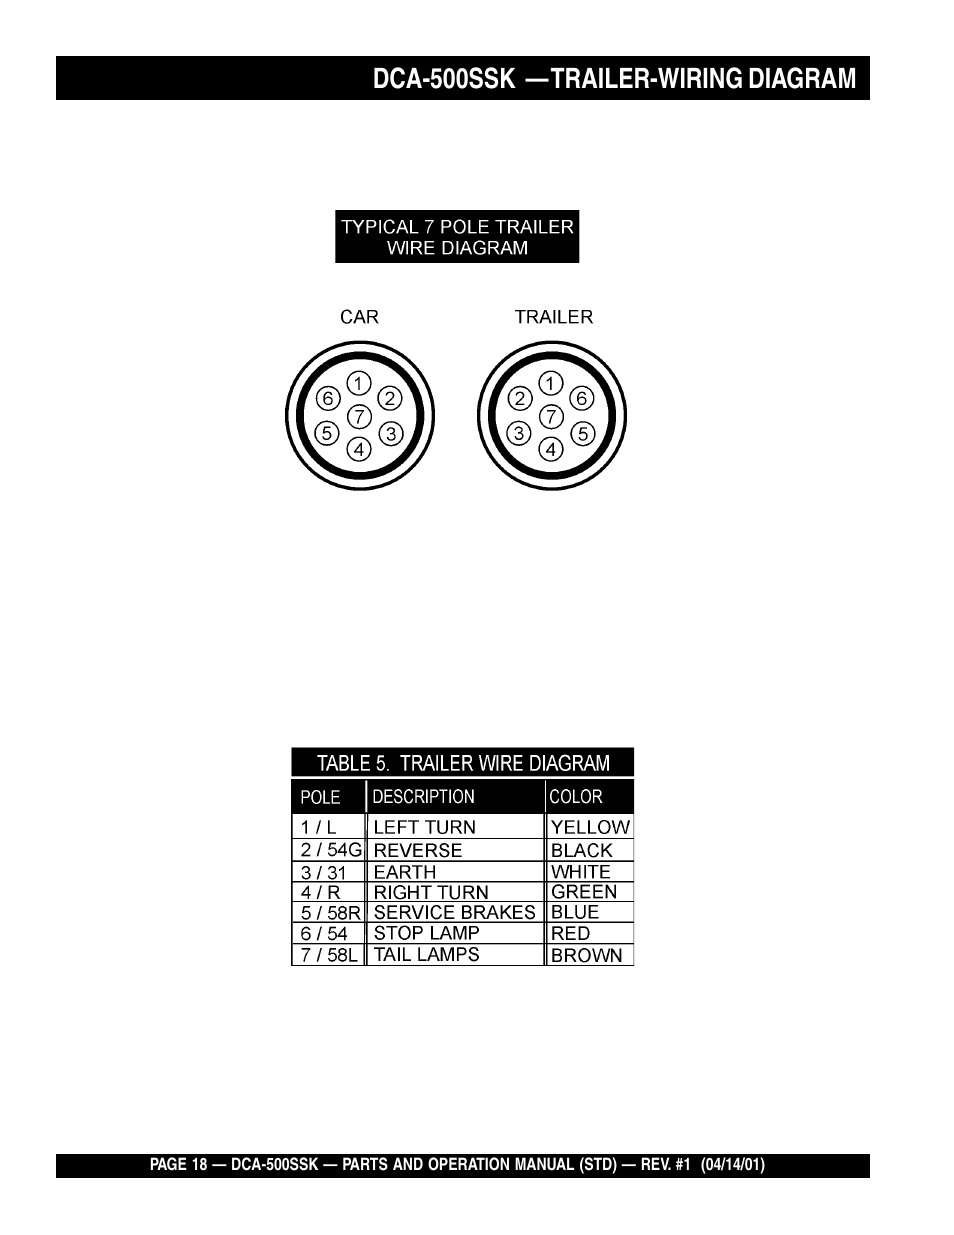 Multiquip 7 Way Trailer Wiring Diagram Good 1st Typical Dca 500ssk Dca500ssk User Rh Manualsdir Com Plug